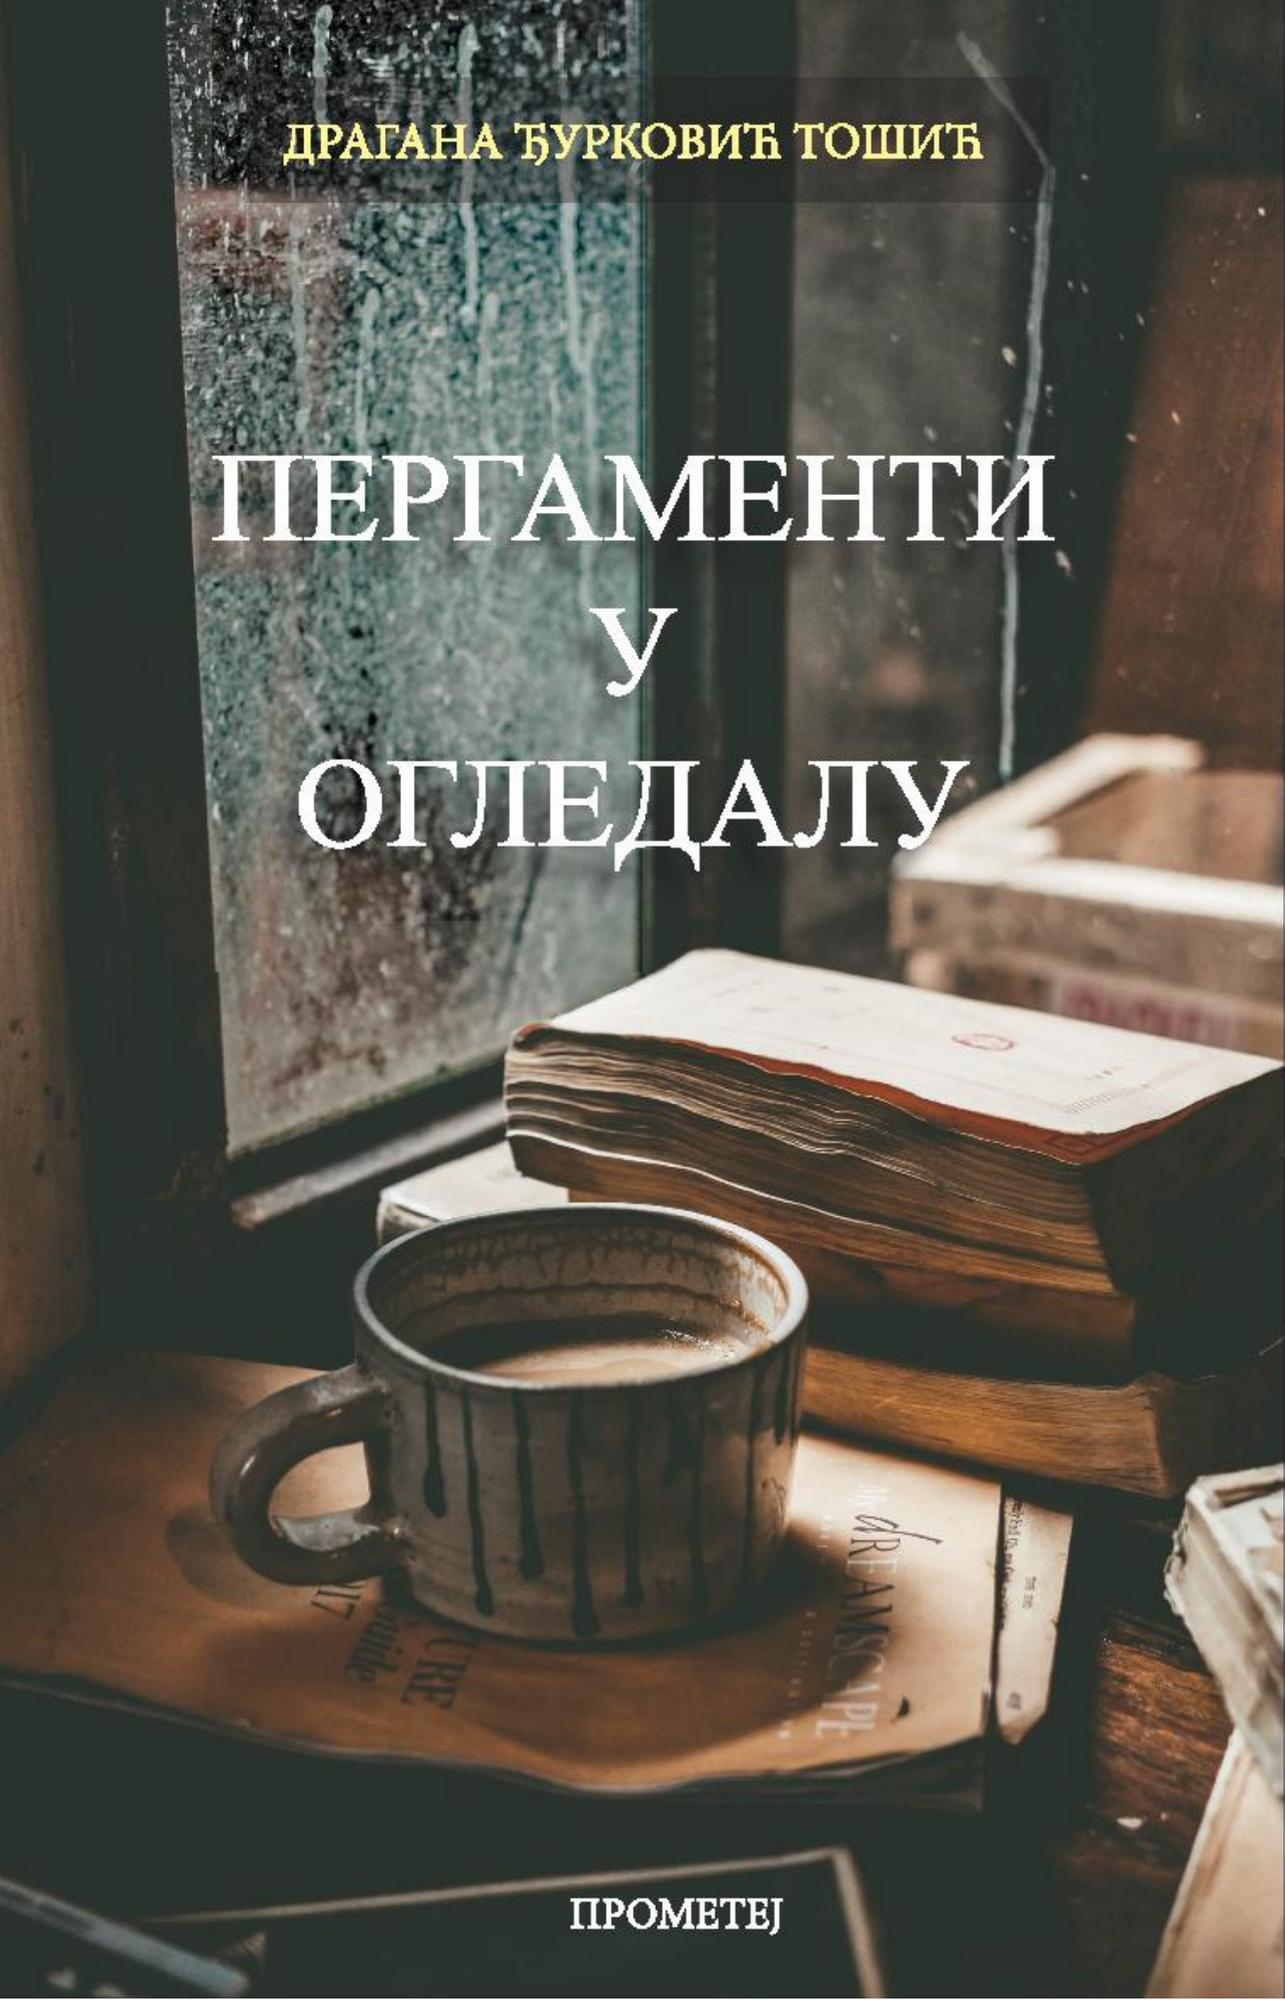 Пергаменти у огледалу